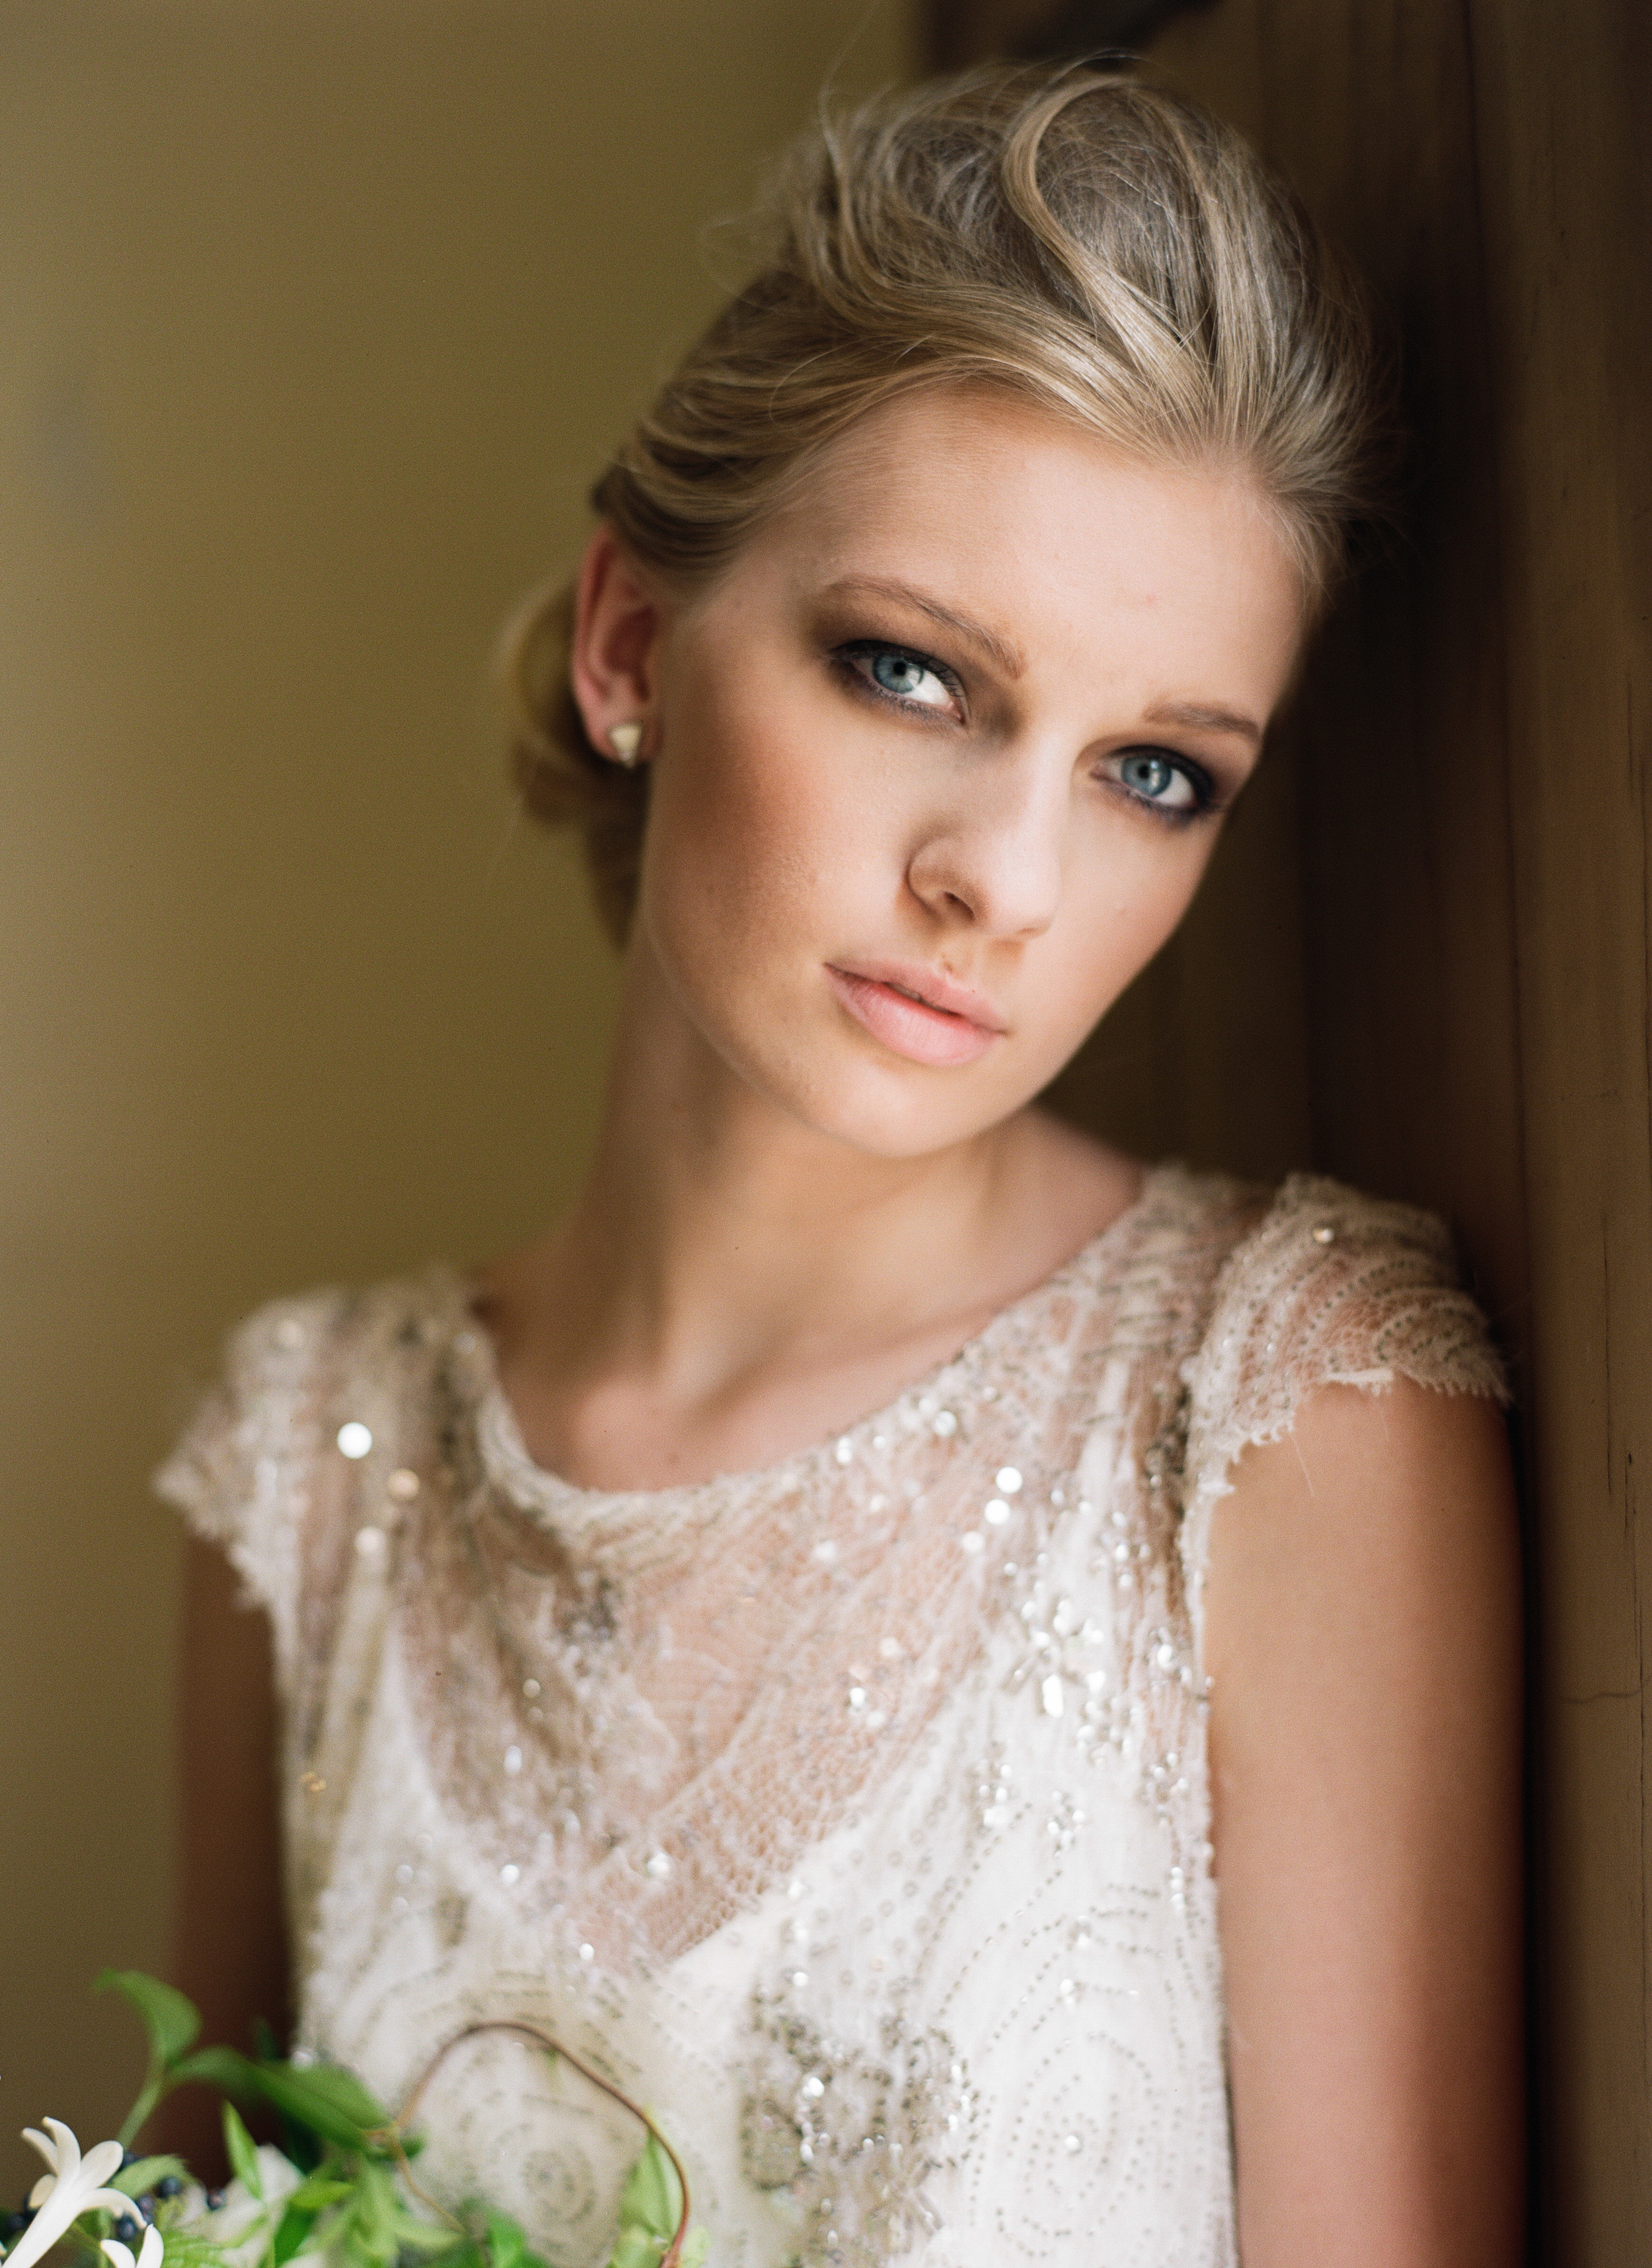 Olivia-Griffin-trendy-bride-magazine-willow-florals-sarah-seven-gwen-ivory-and-beau-bridal-boutique-savannah-wedding-dresses-savannah-bridal-boutique-savannah-wedding-savannah-bridal-gowns-savannah-wedding-planner-georgia-bridal-boutique-21.JPG